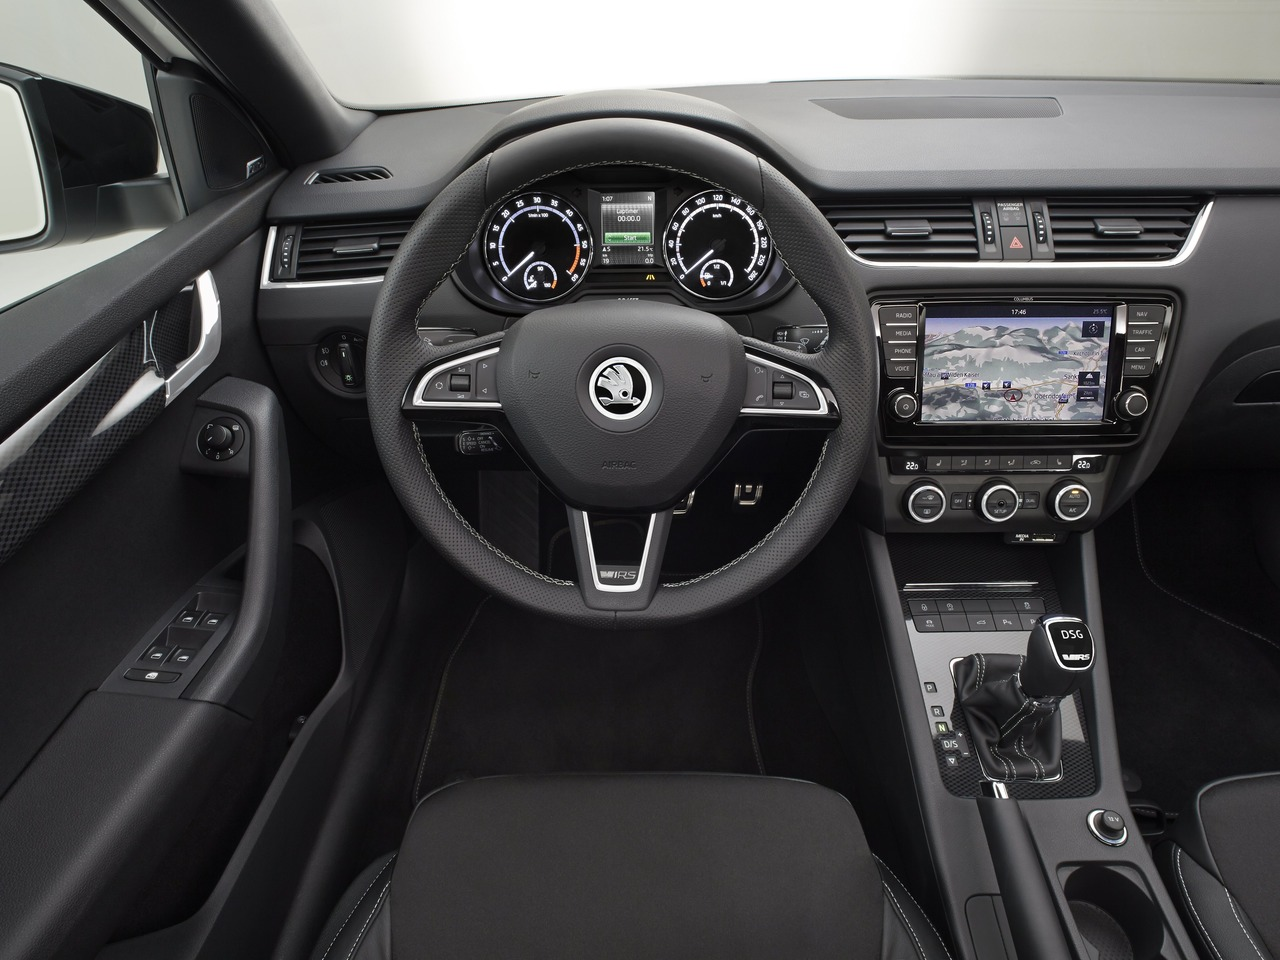 Снимки: Skoda Octavia RS III